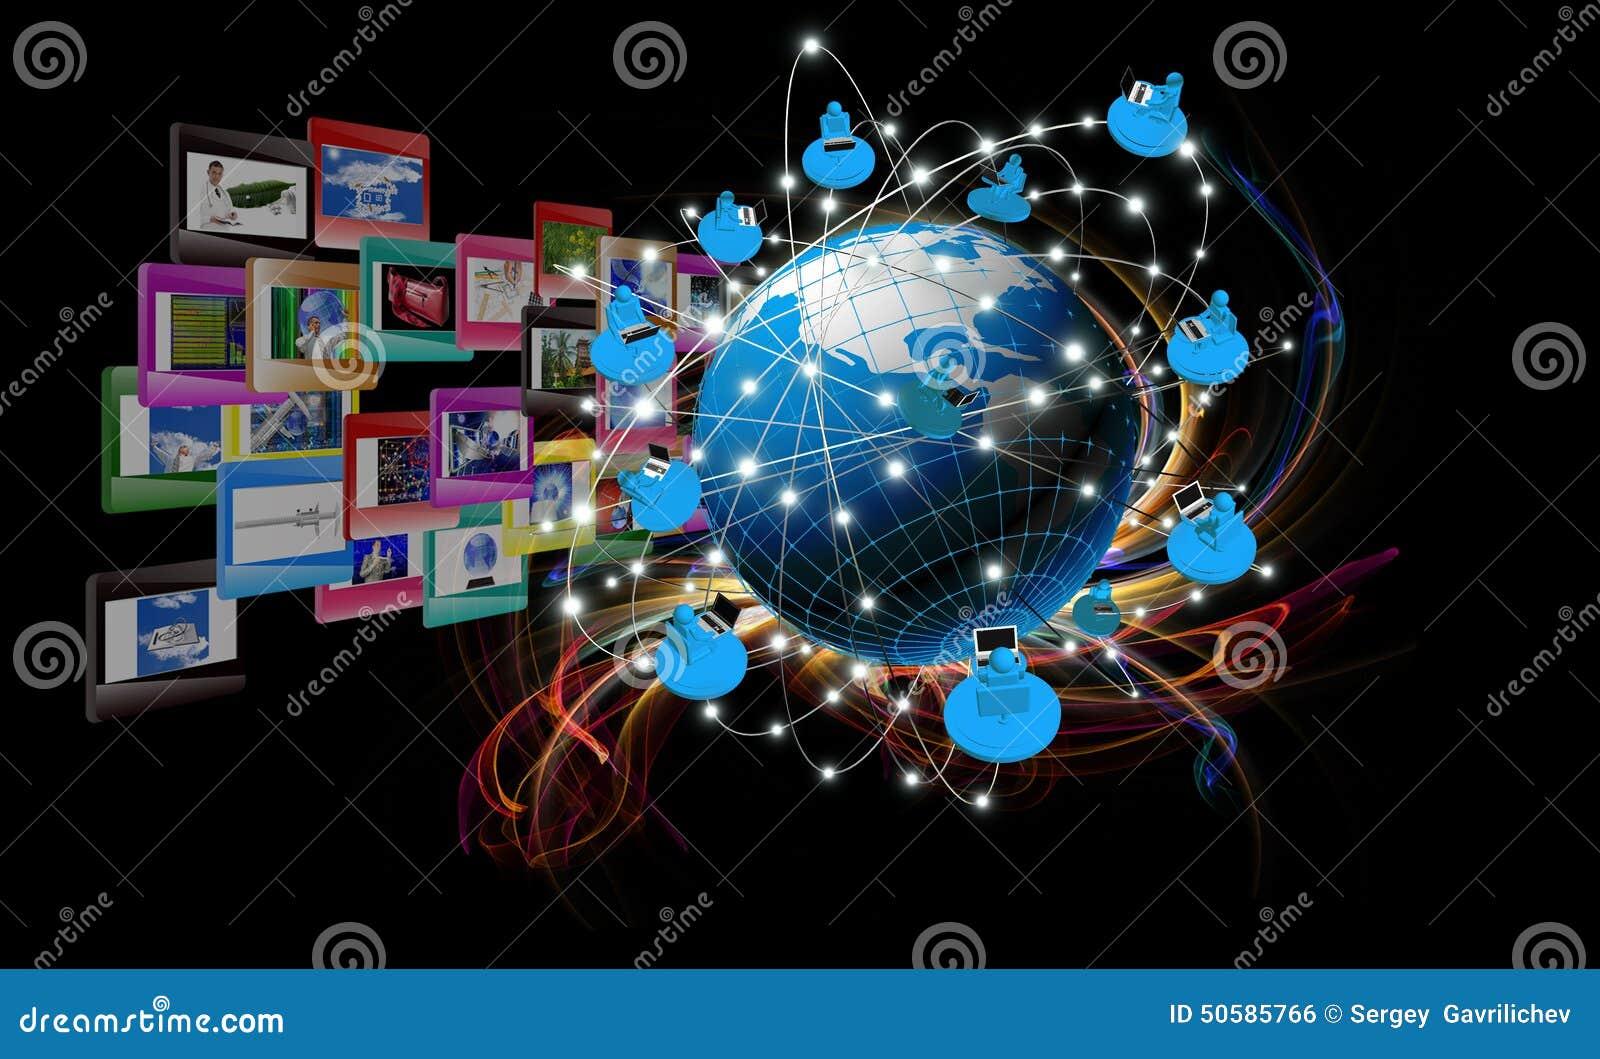 Super Modern Innovation Compiting Technology Stock Illustration #VG_25